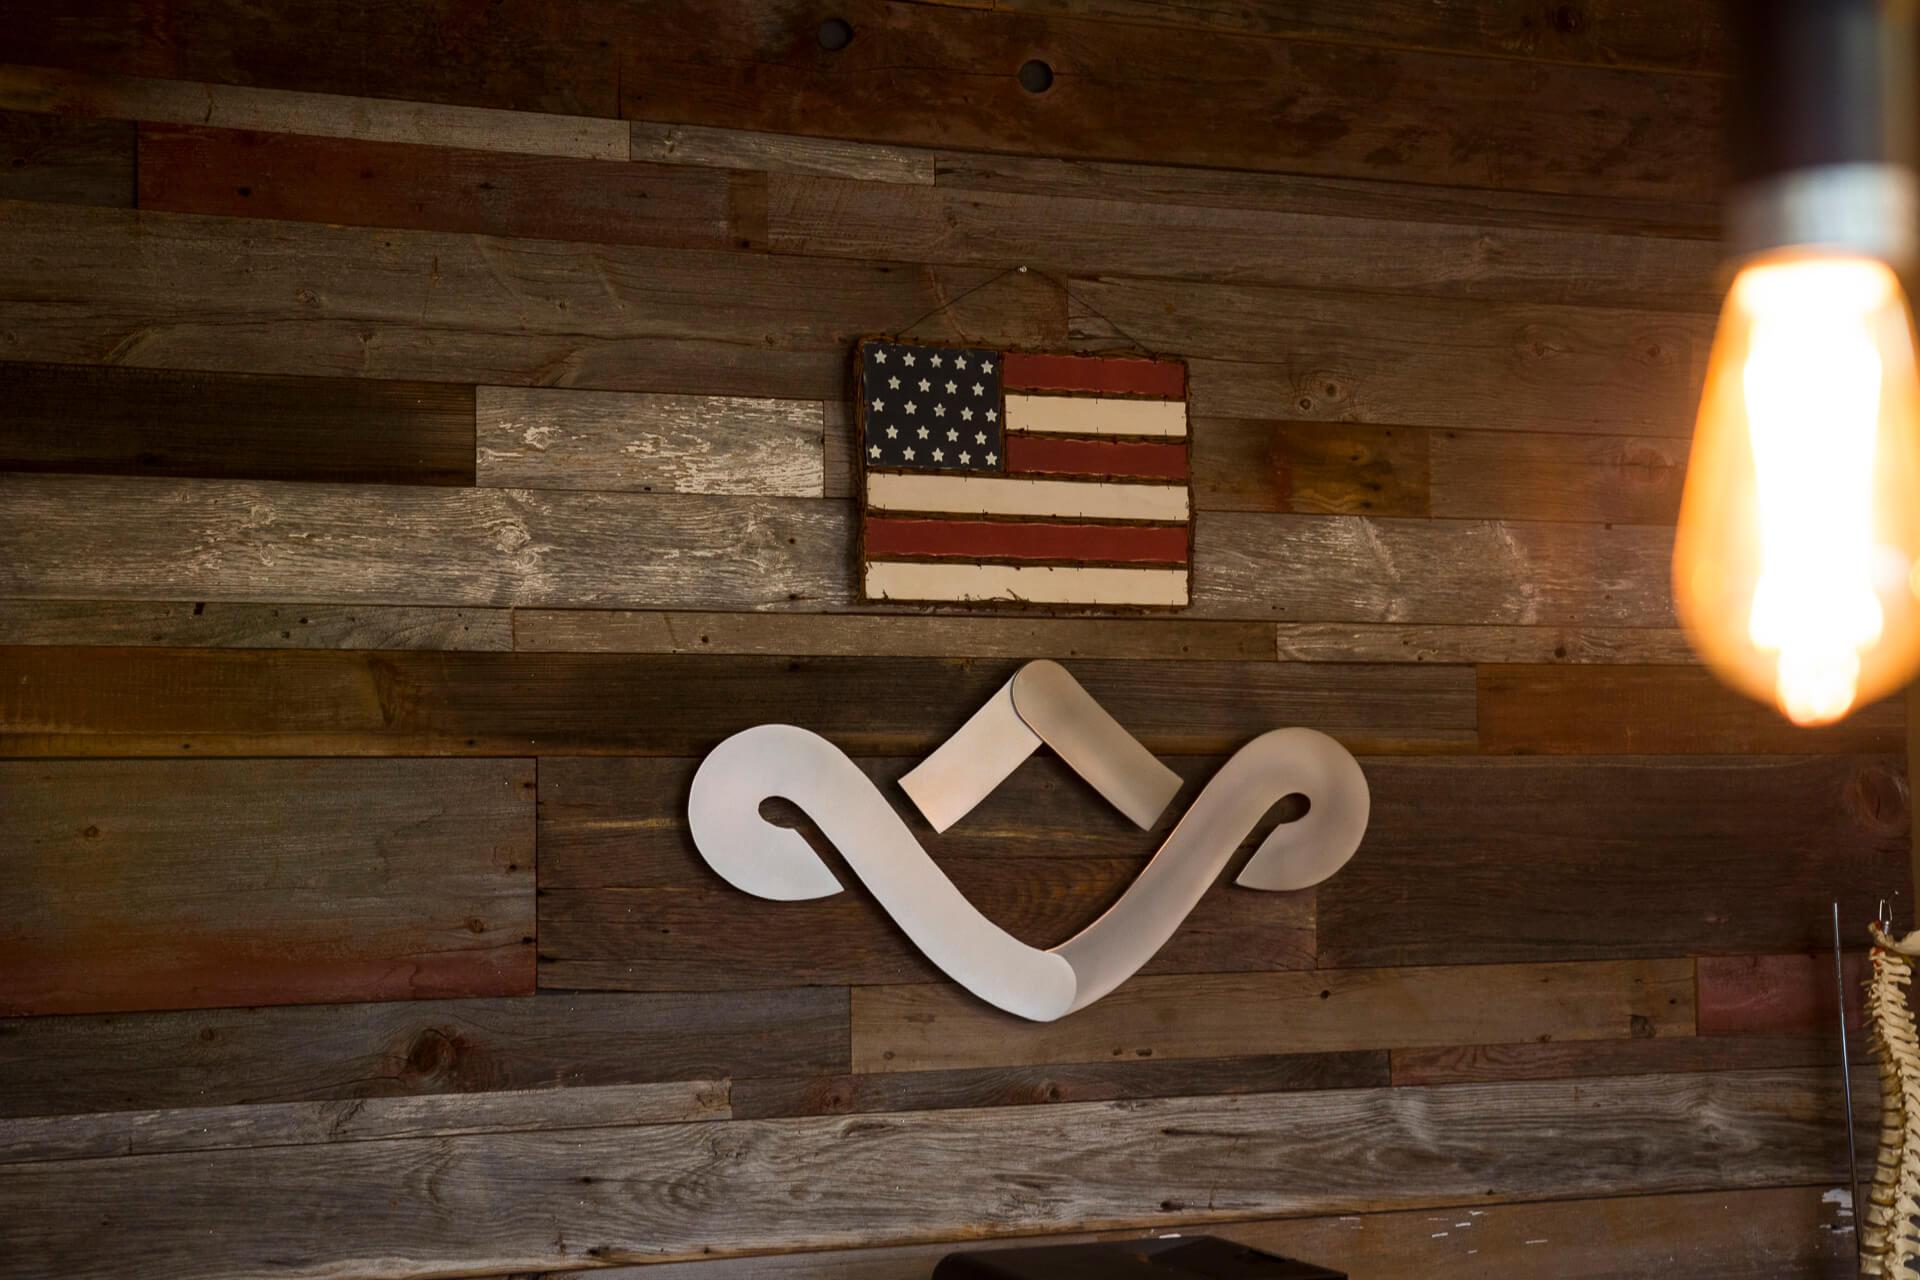 Logo and American flag on barn wood wall